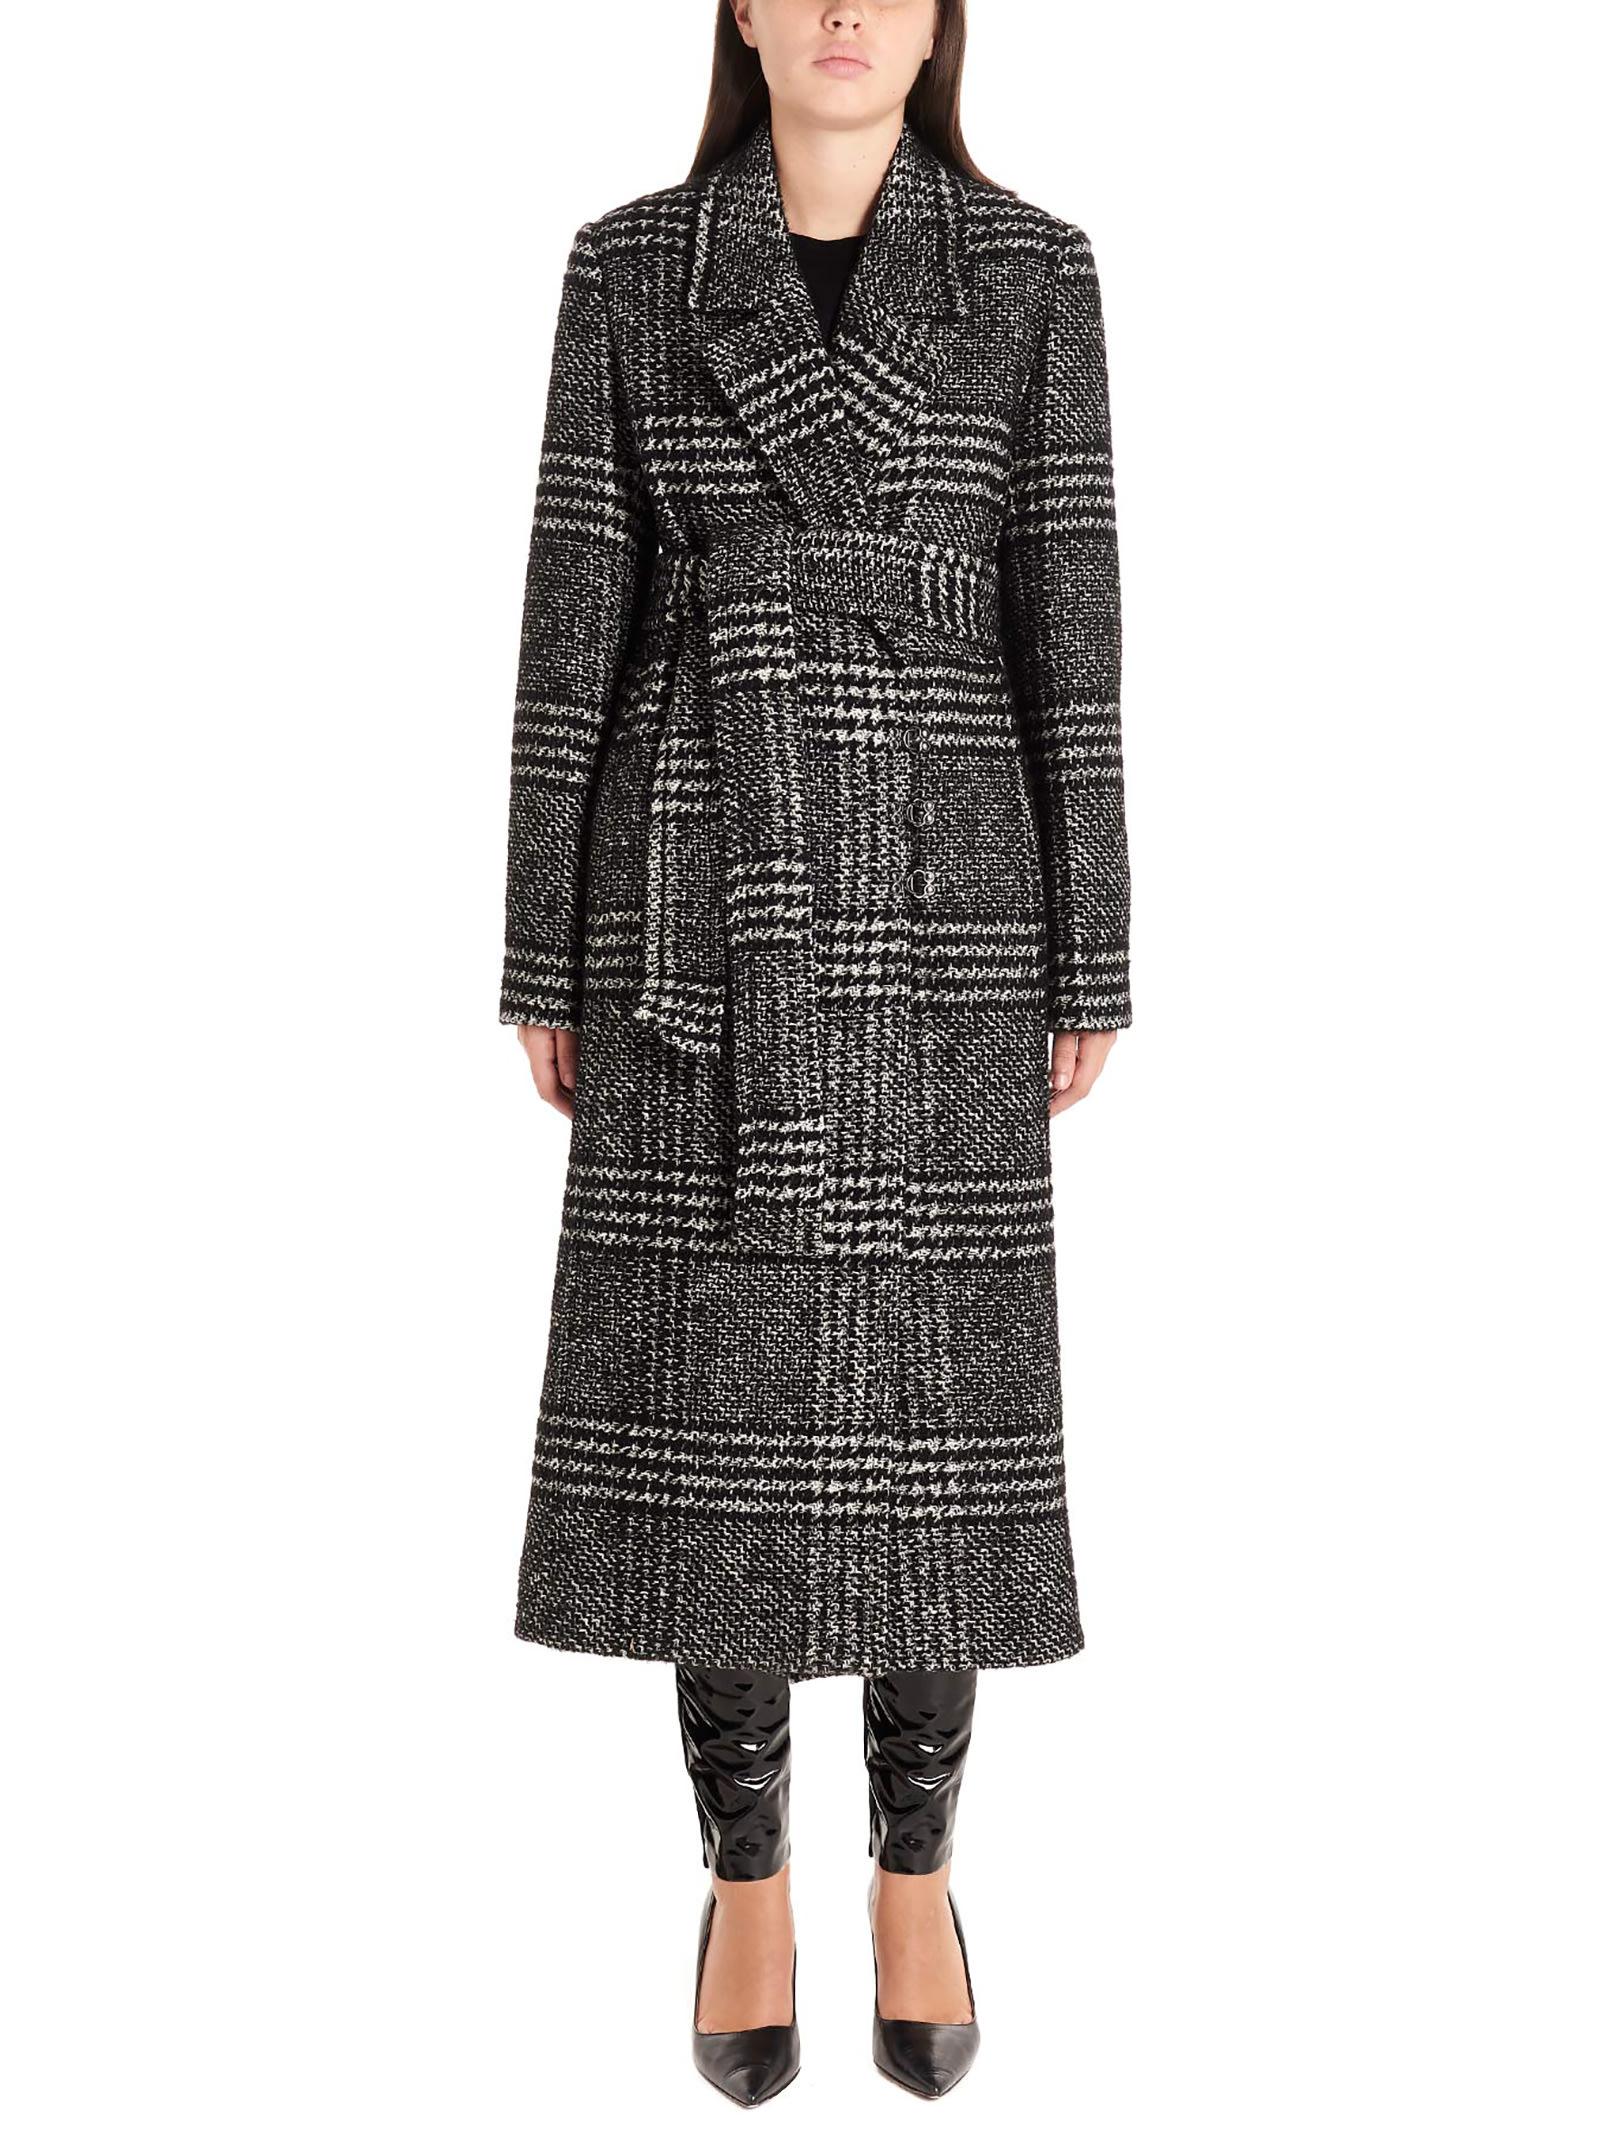 Karl Lagerfeld Coat